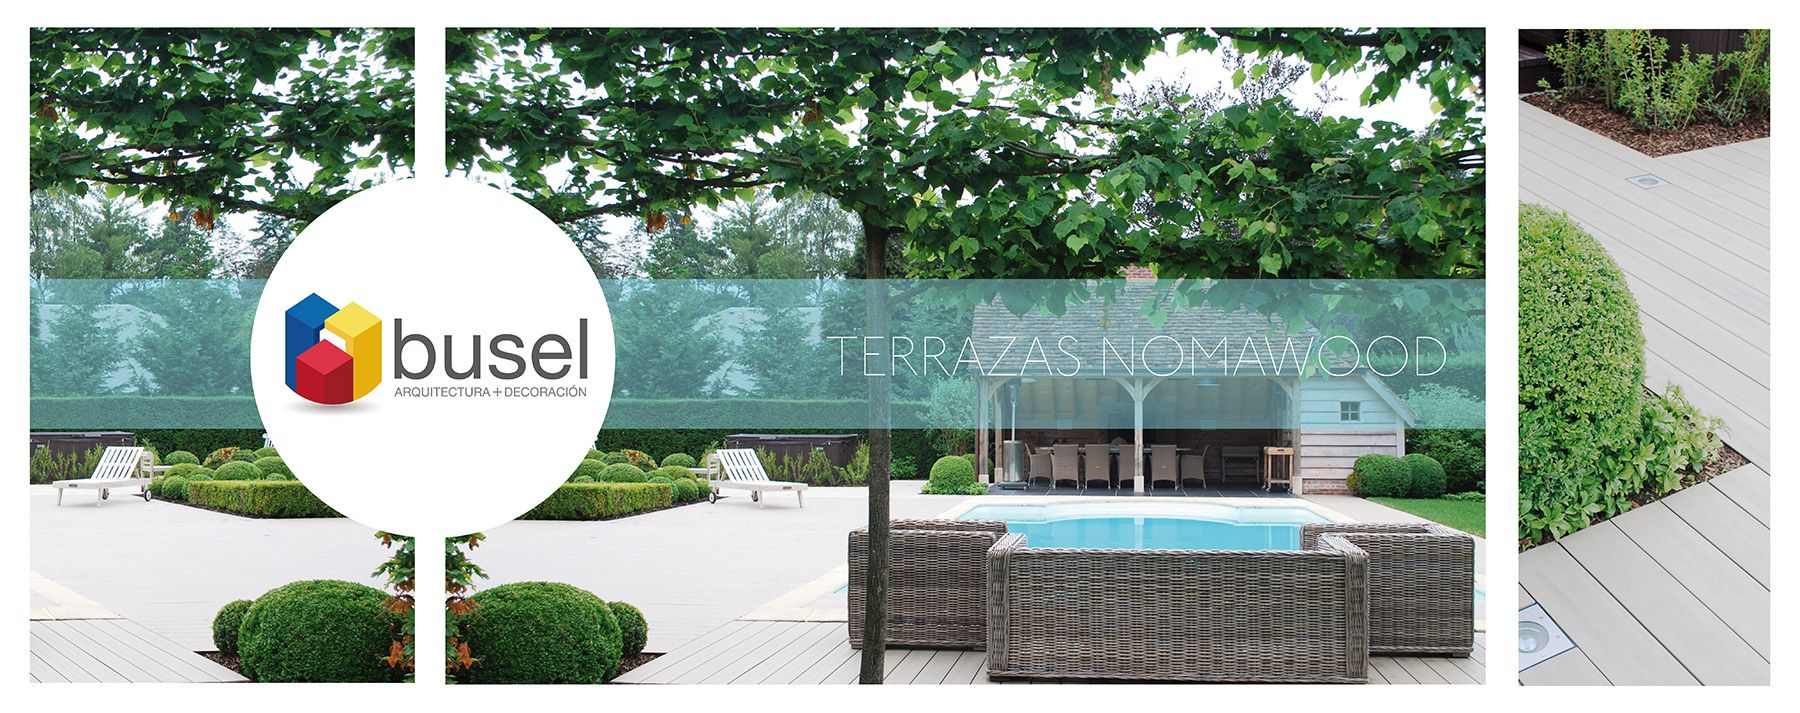 #Terrazas #Nomawood #Arquitectura #Paisajismo #Piscinas #Deck #Verano